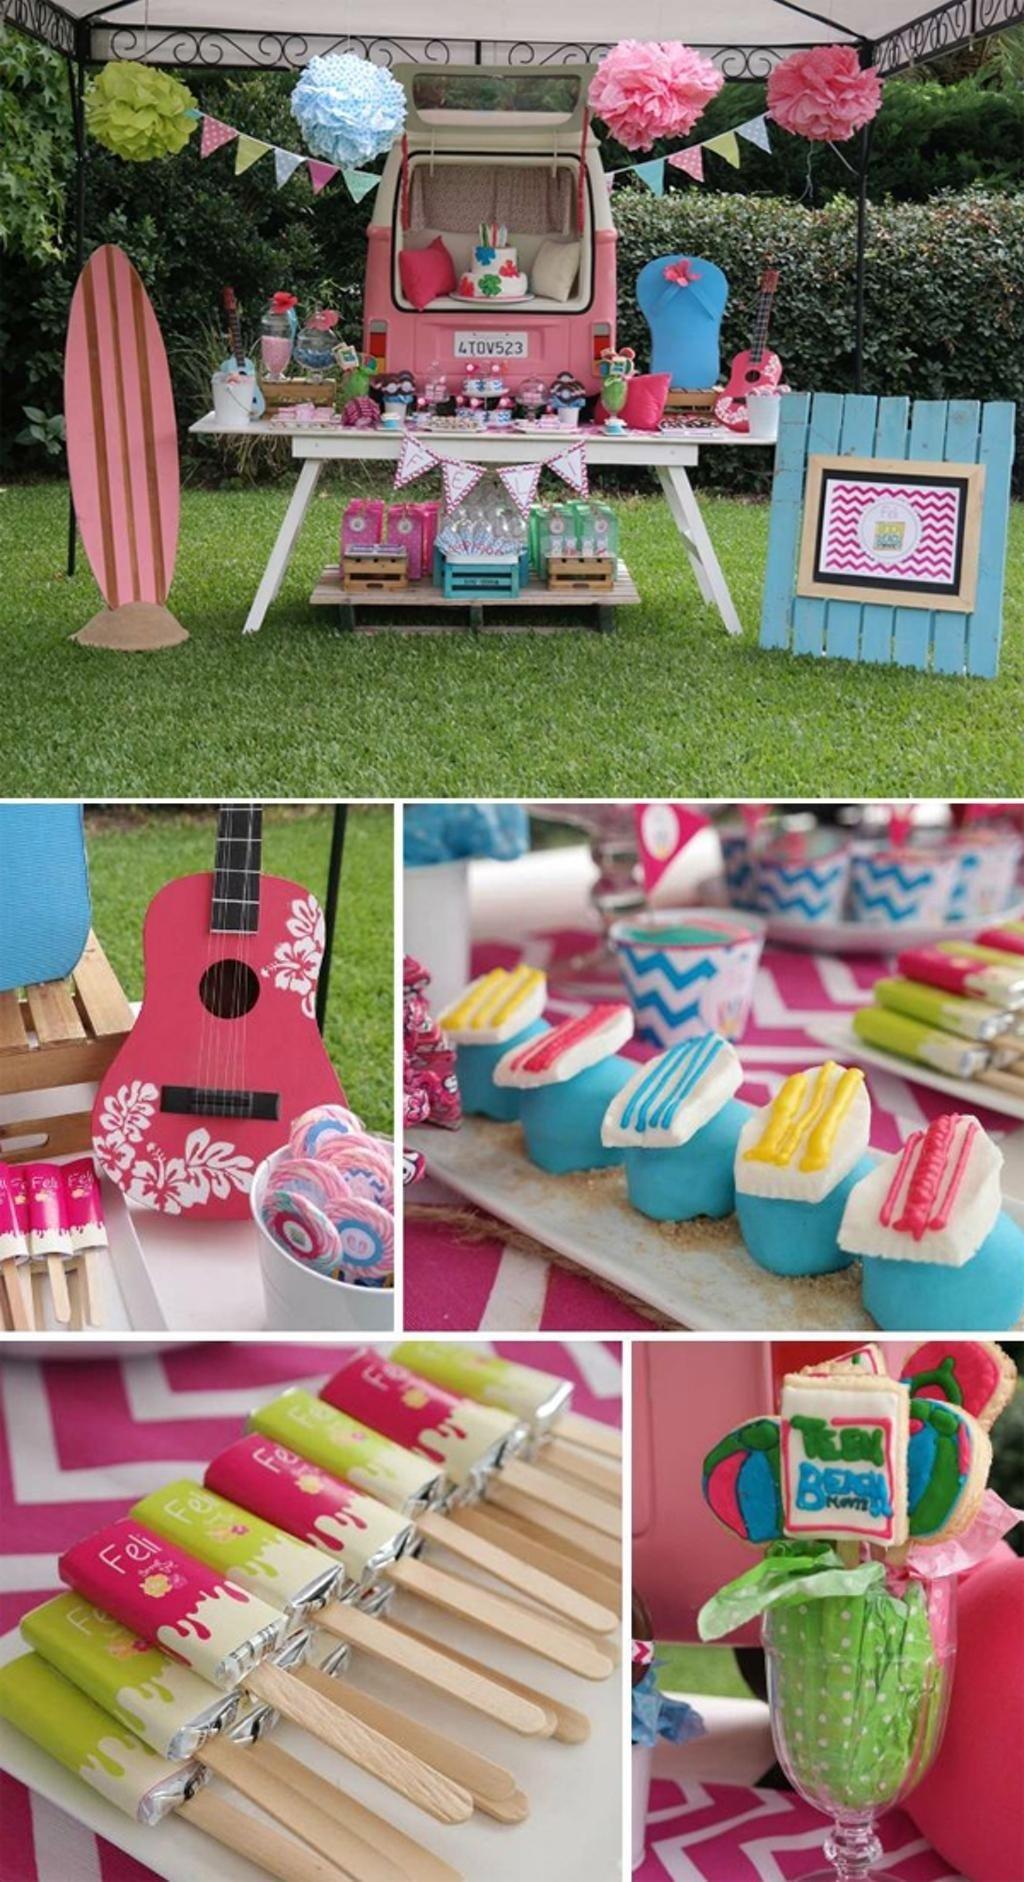 10 Nice Birthday Party Ideas For Teenage Girls 14 awesome summer birthday party ideas for teenagers wall maxx